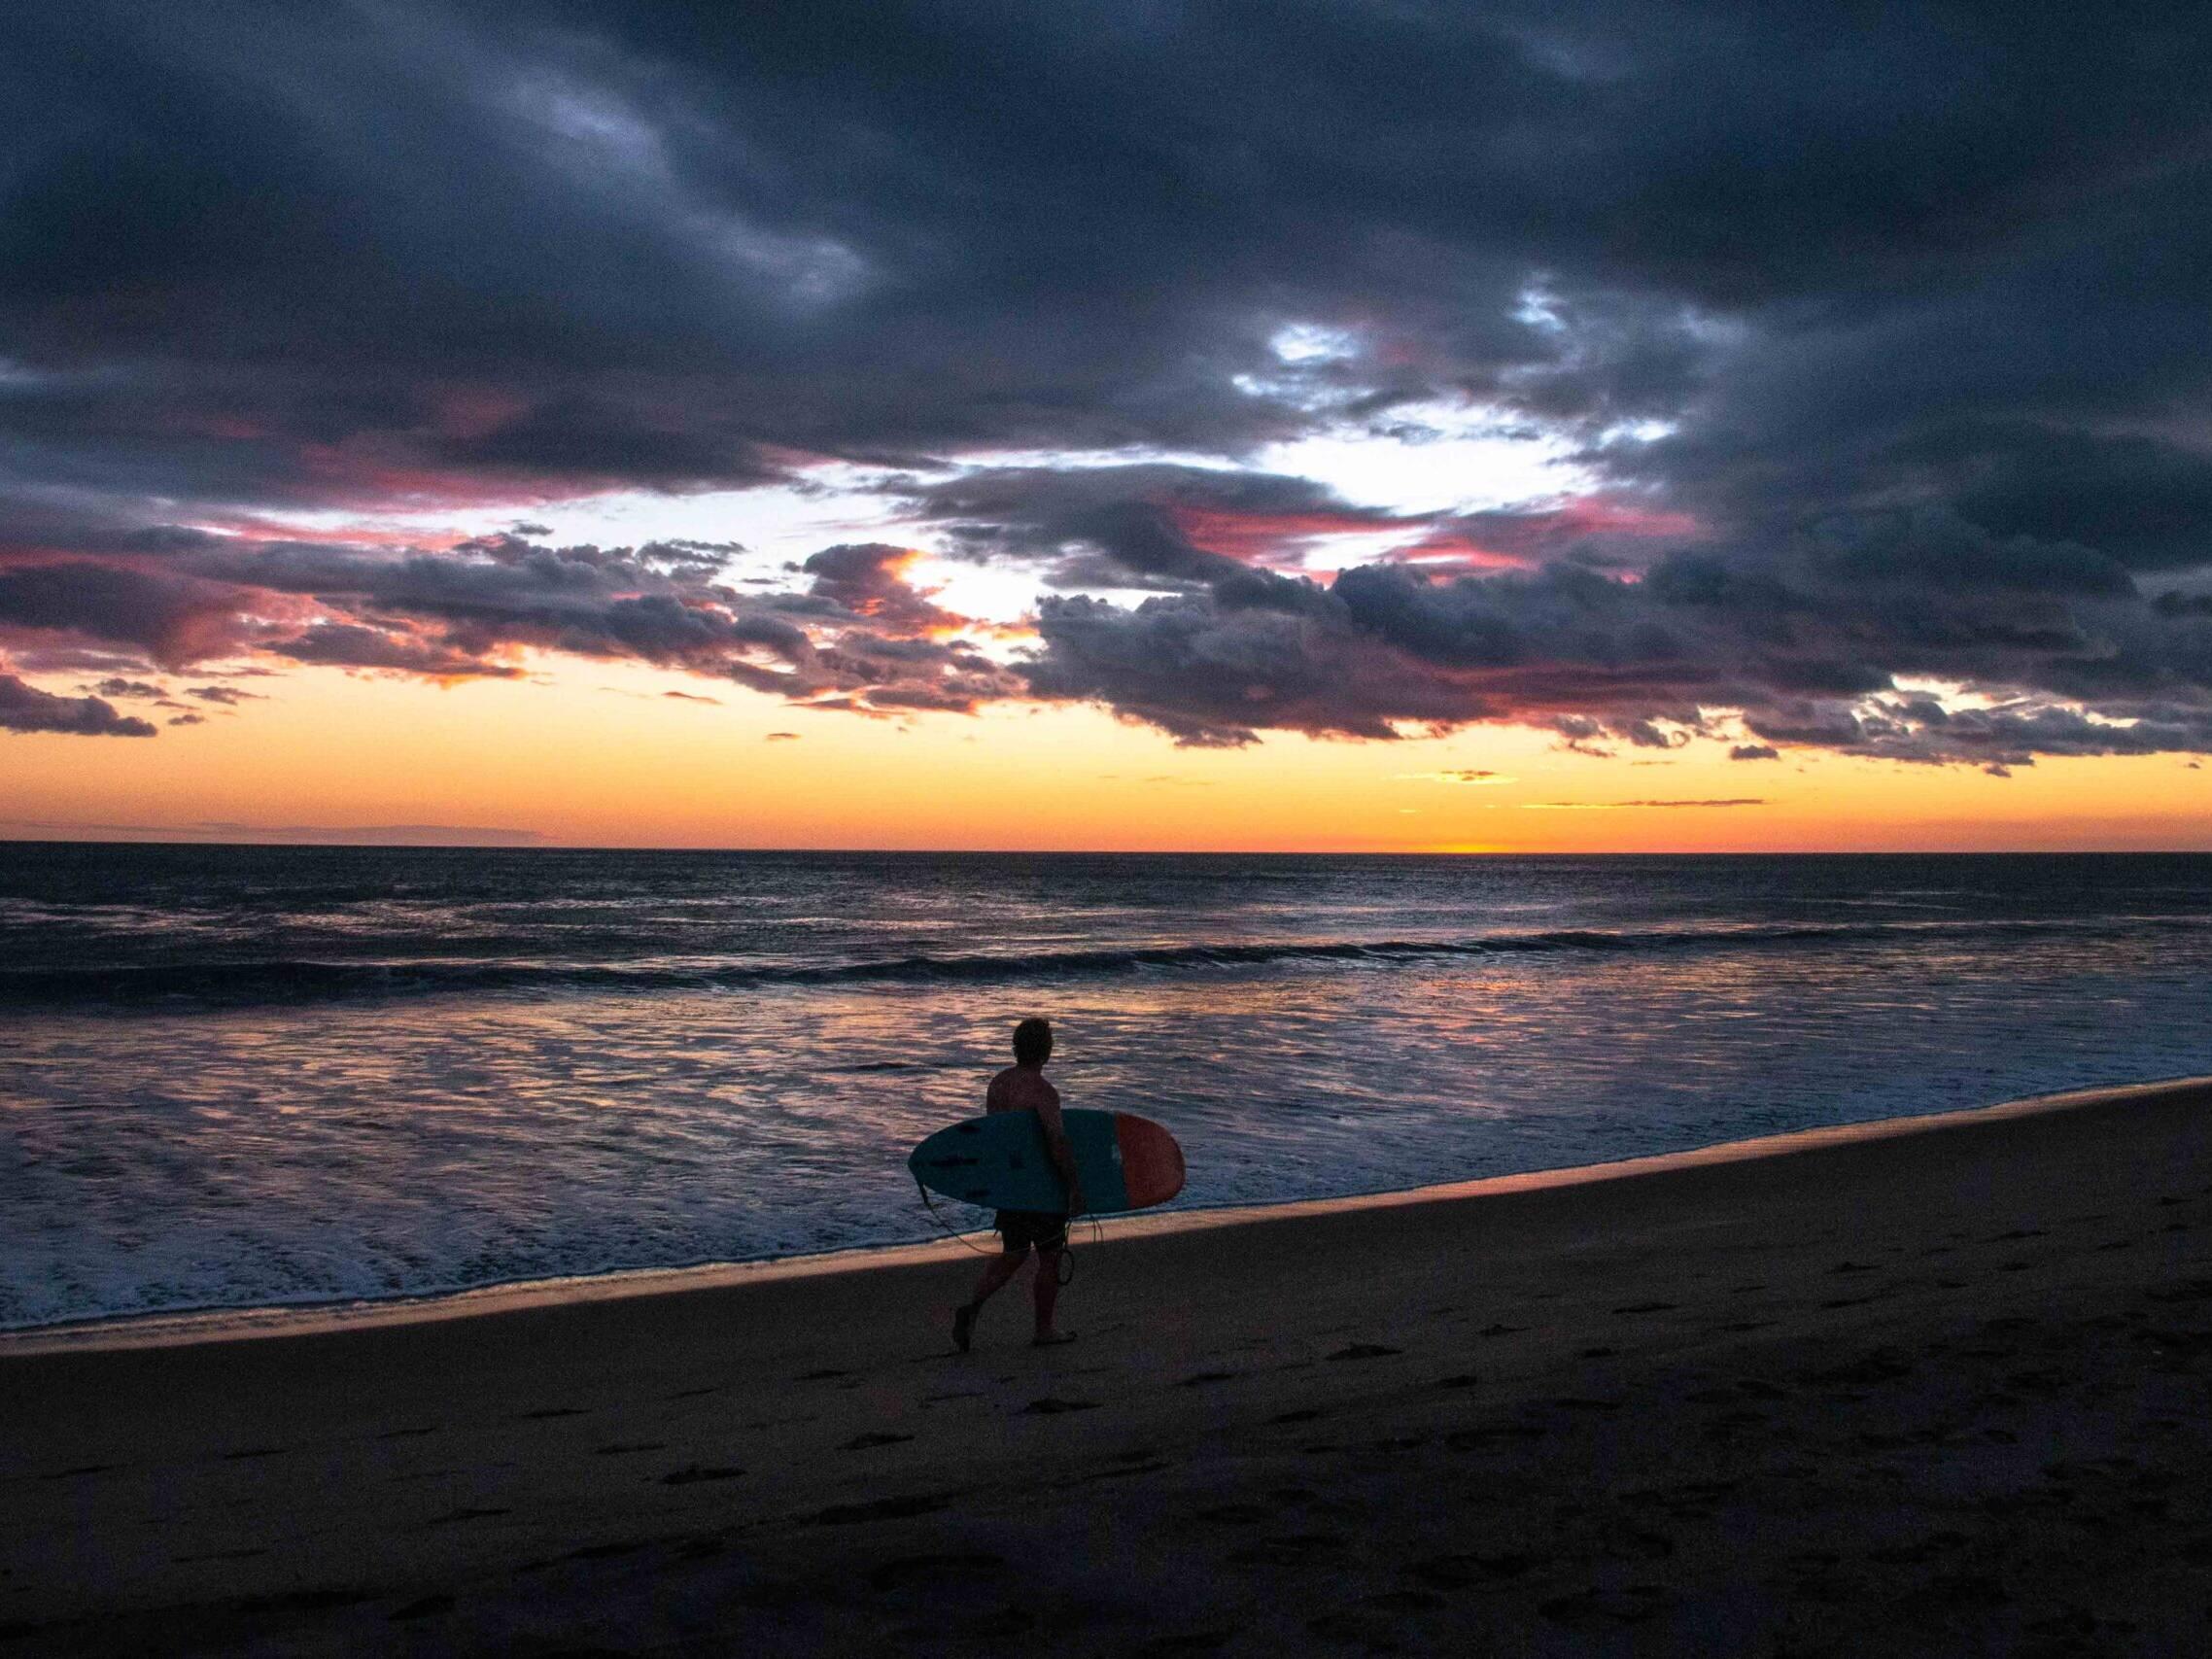 Sunset at Playa Guasacate